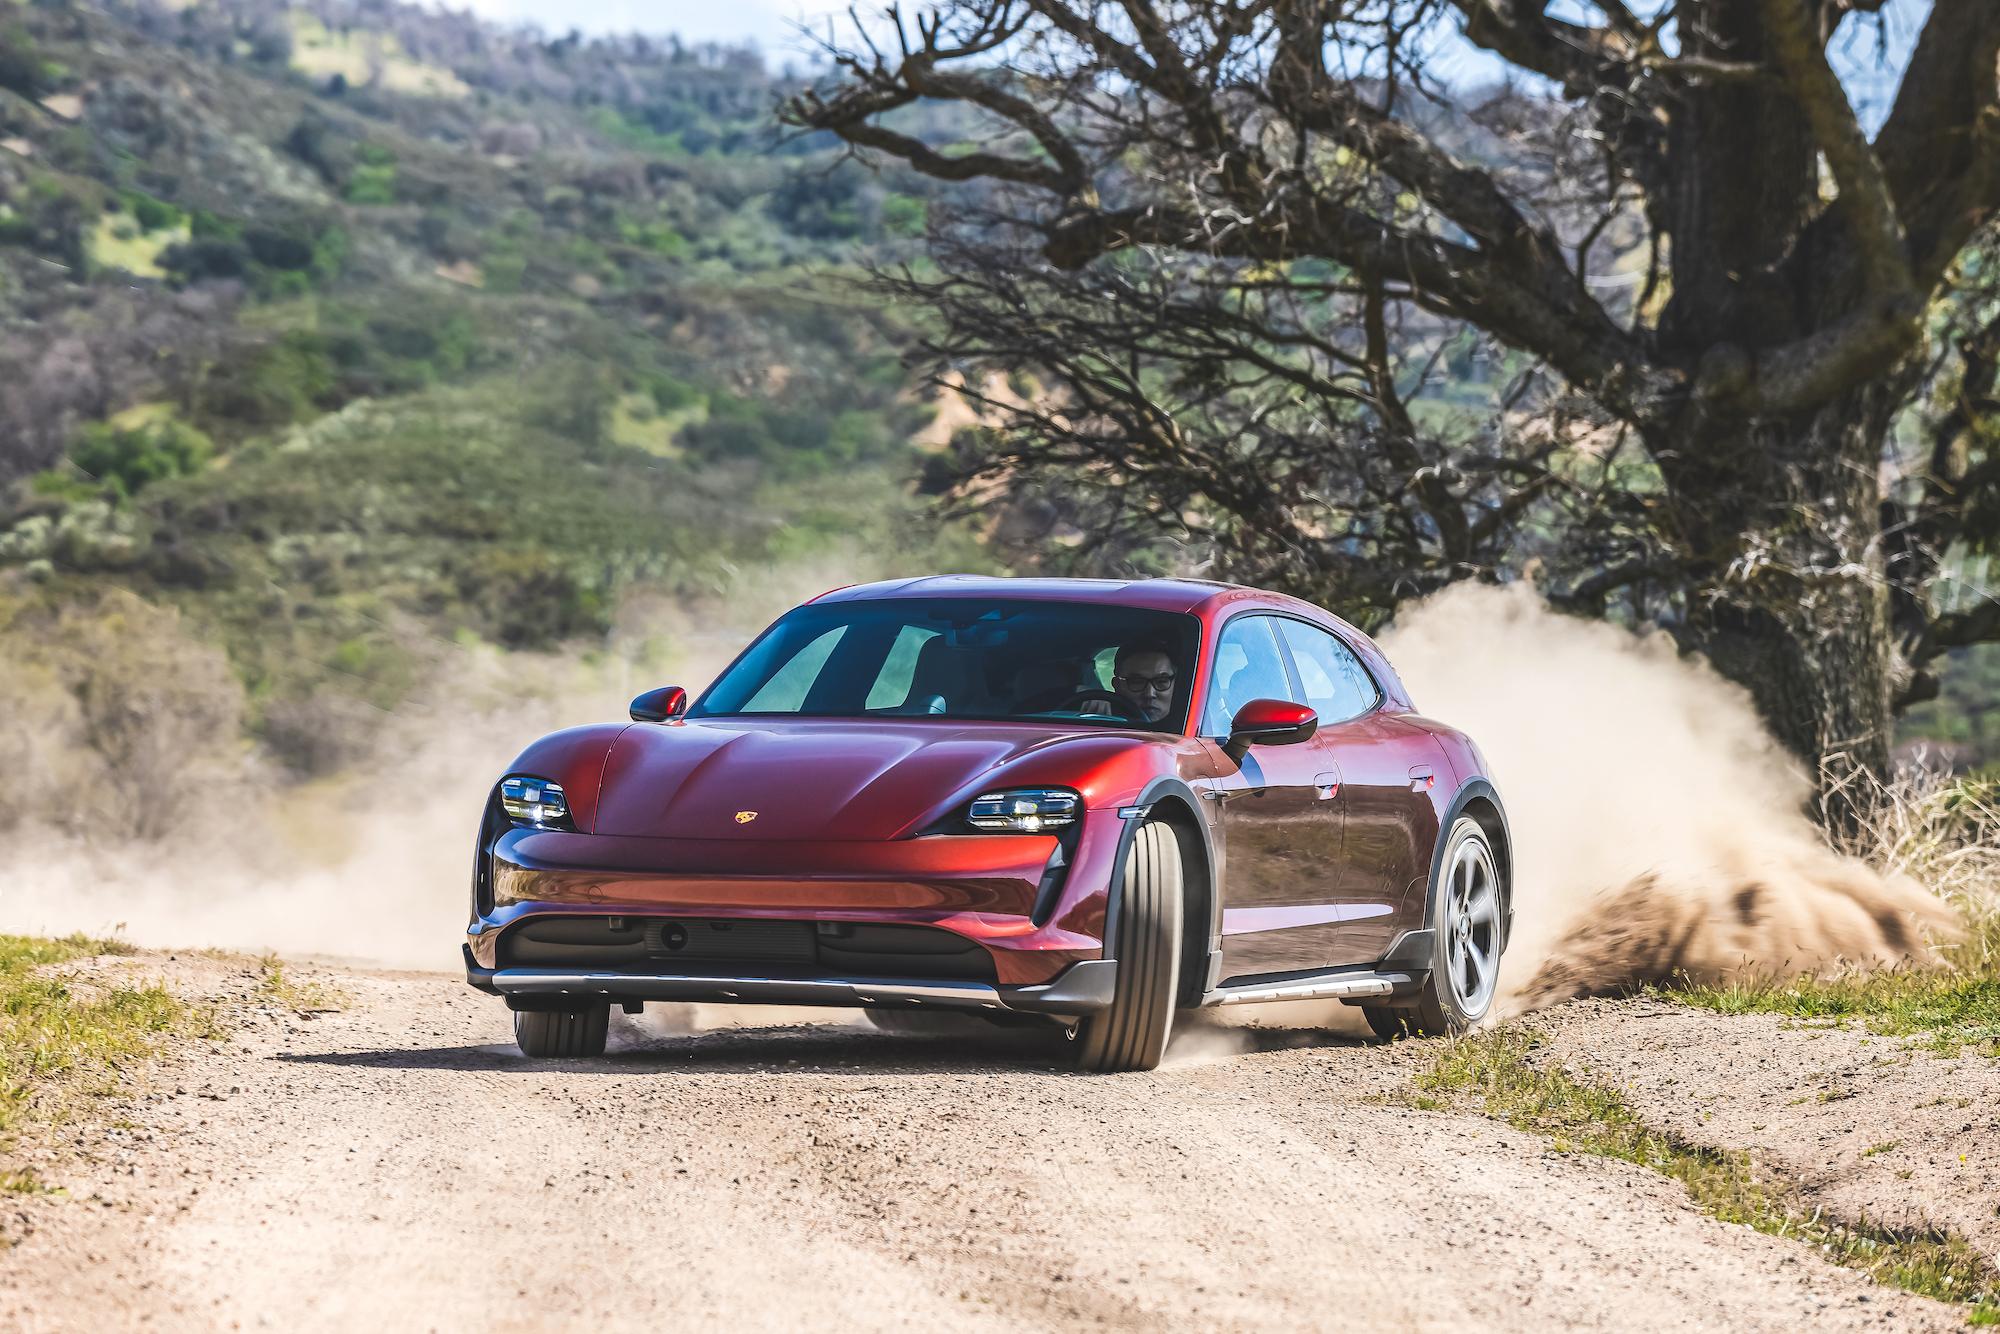 Porsche Taycan 4 Cross Turismo